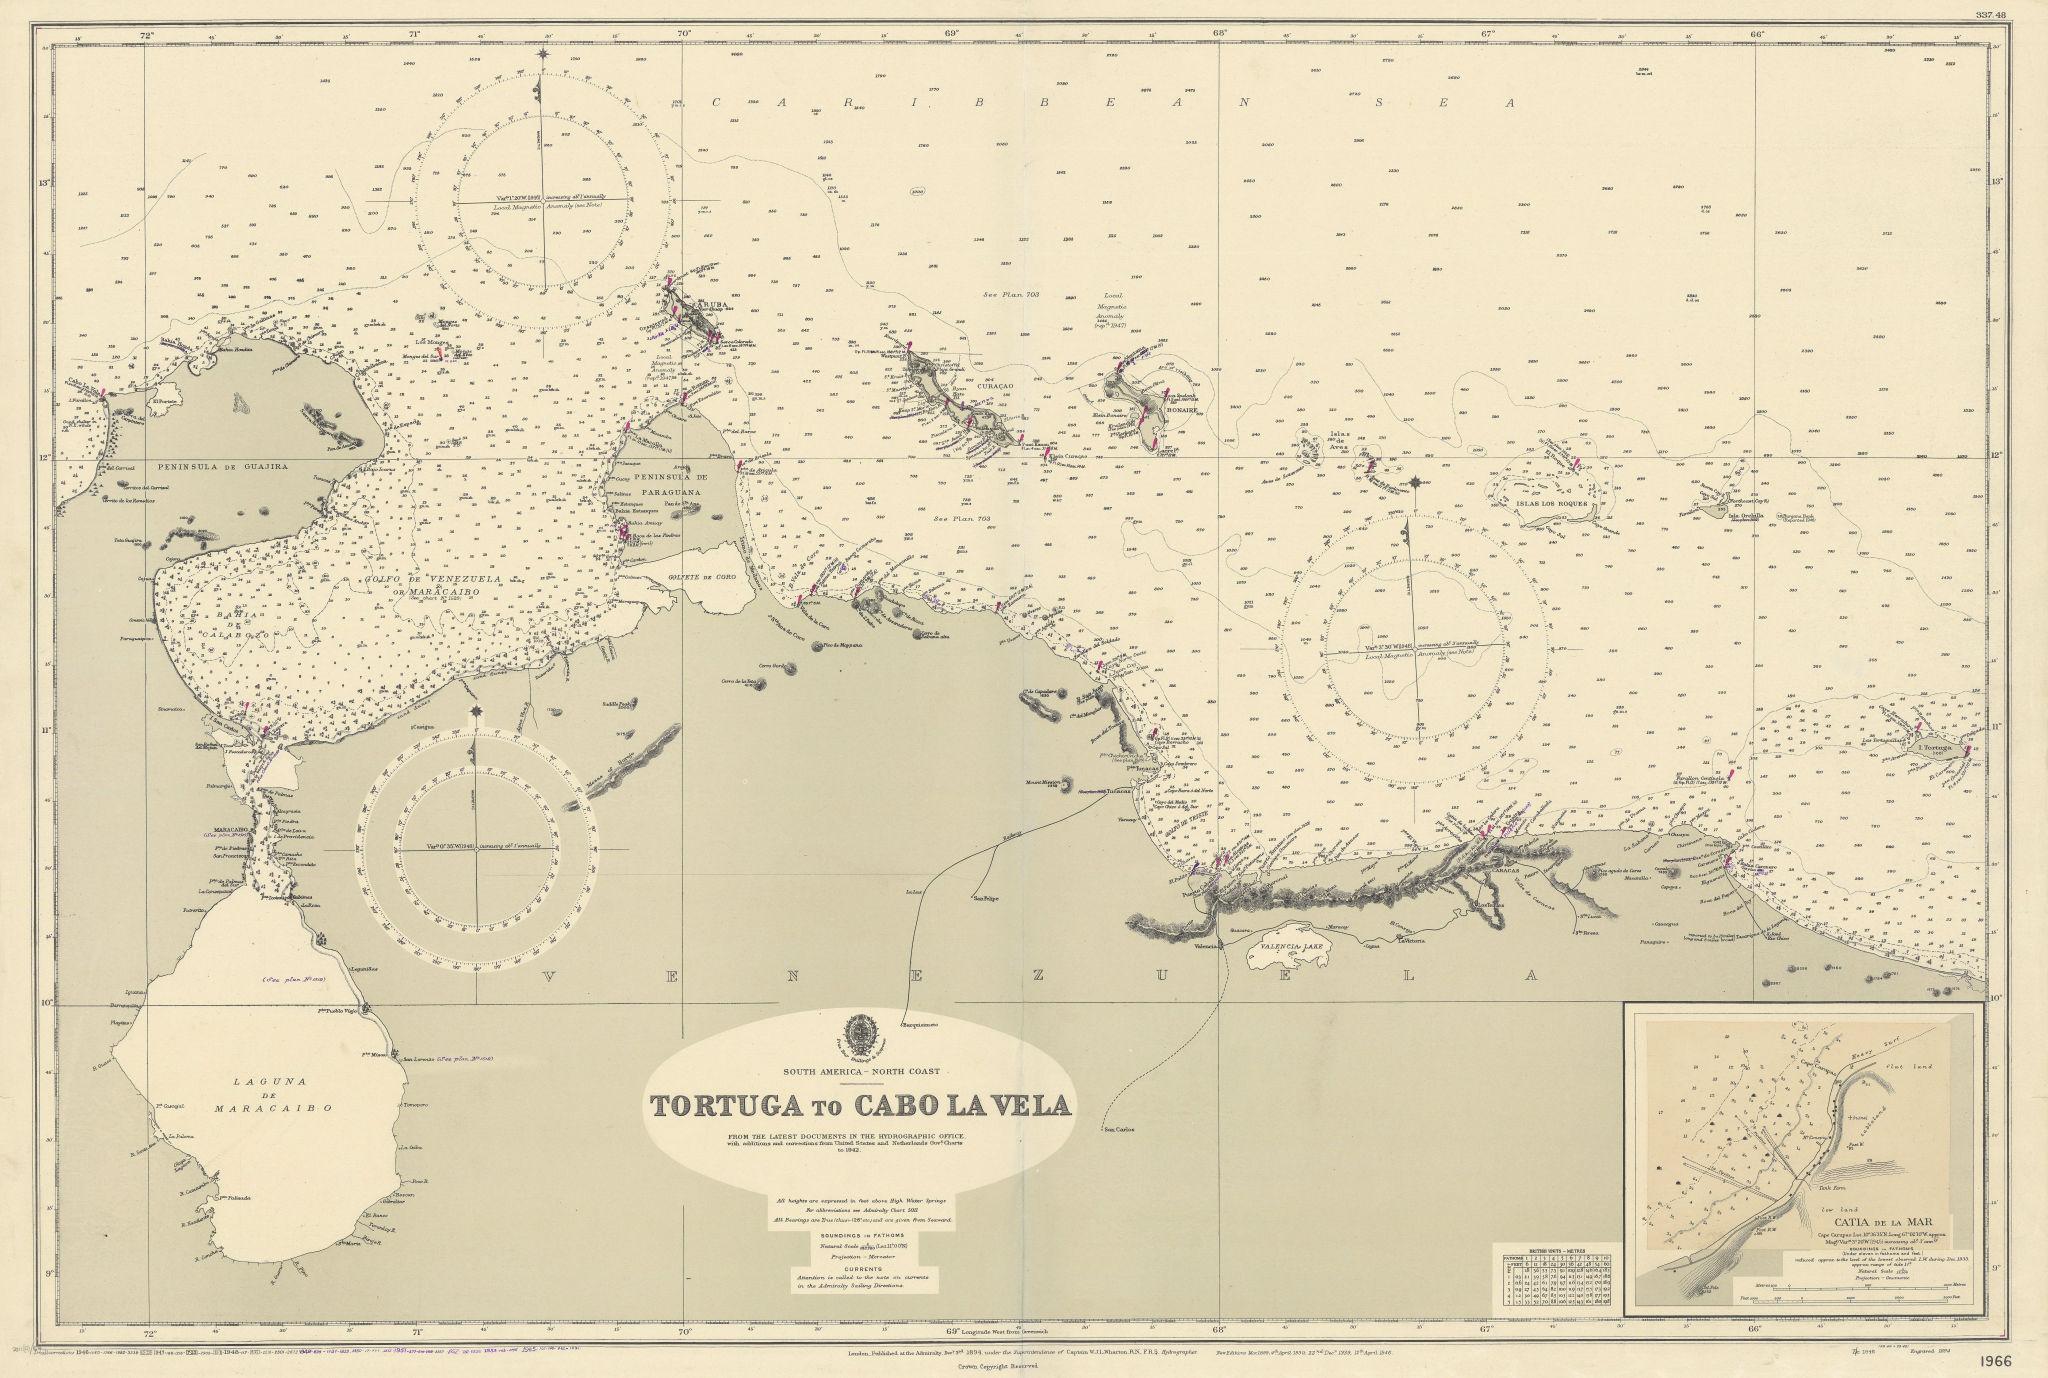 Venezuela coast. Aruba Bonaire Curacao. ADMIRALTY sea chart 1894 (1955) map